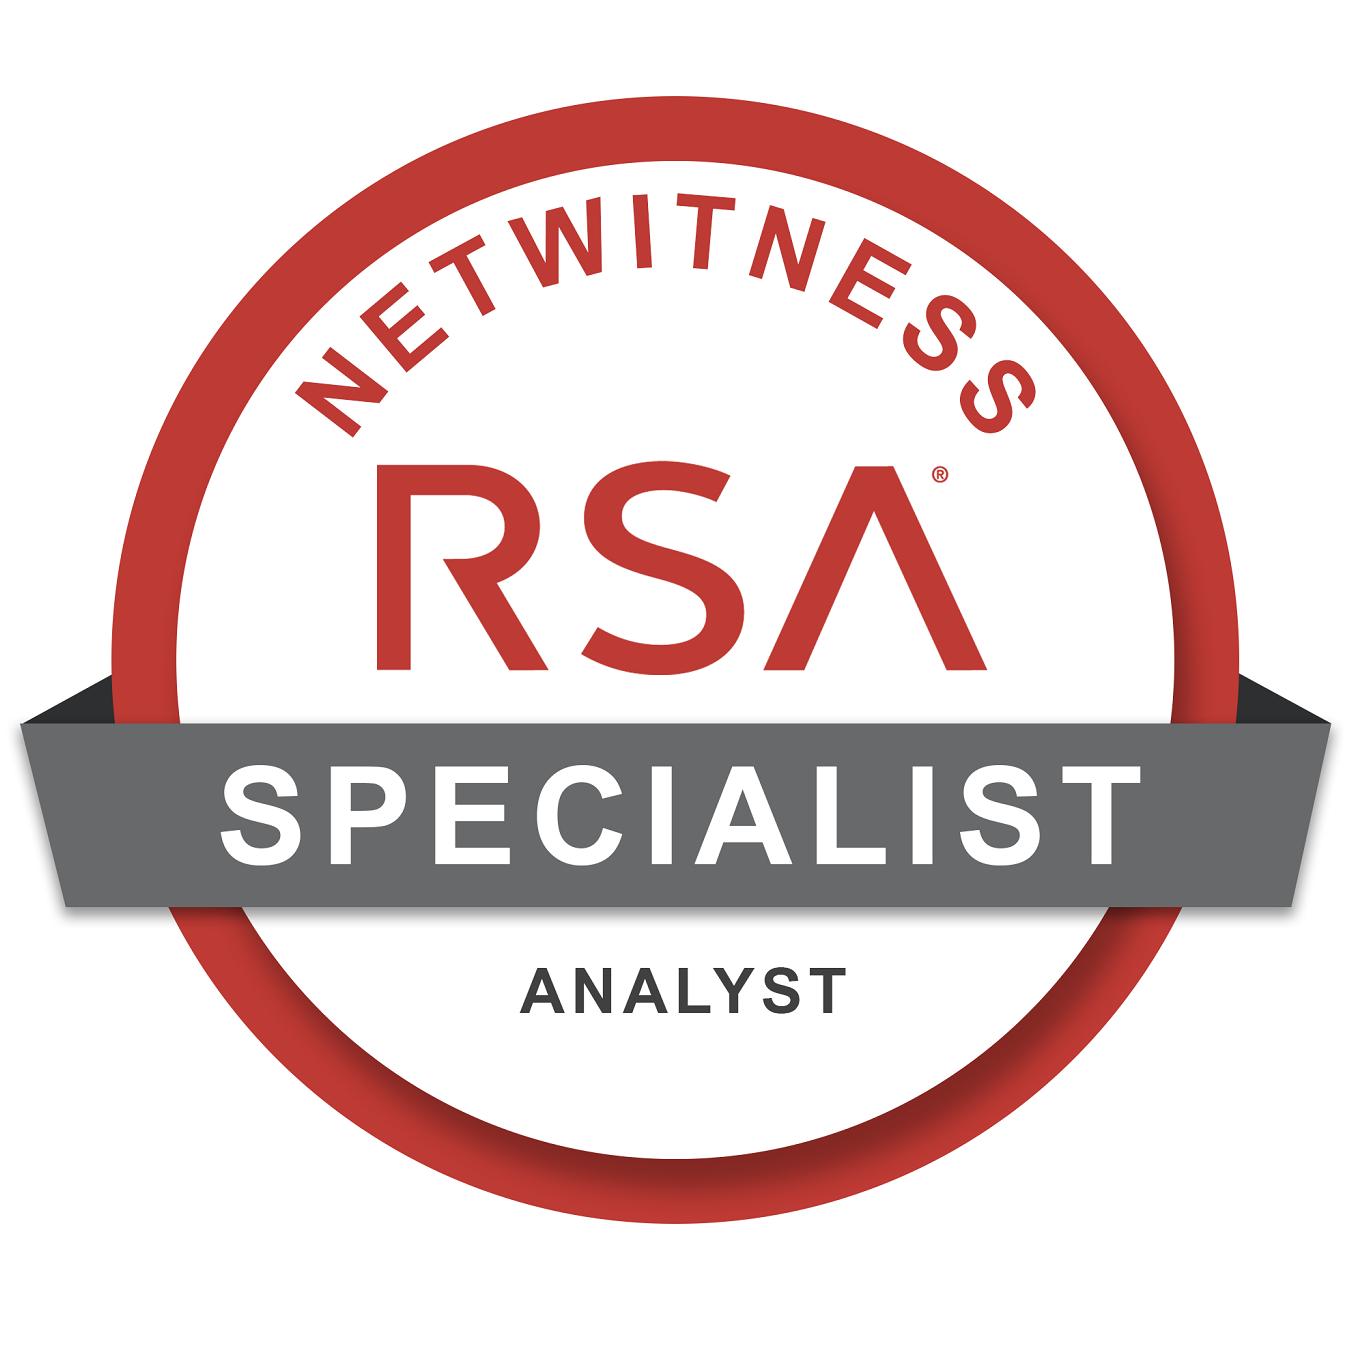 NetWitness Certified Specialist - Analyst